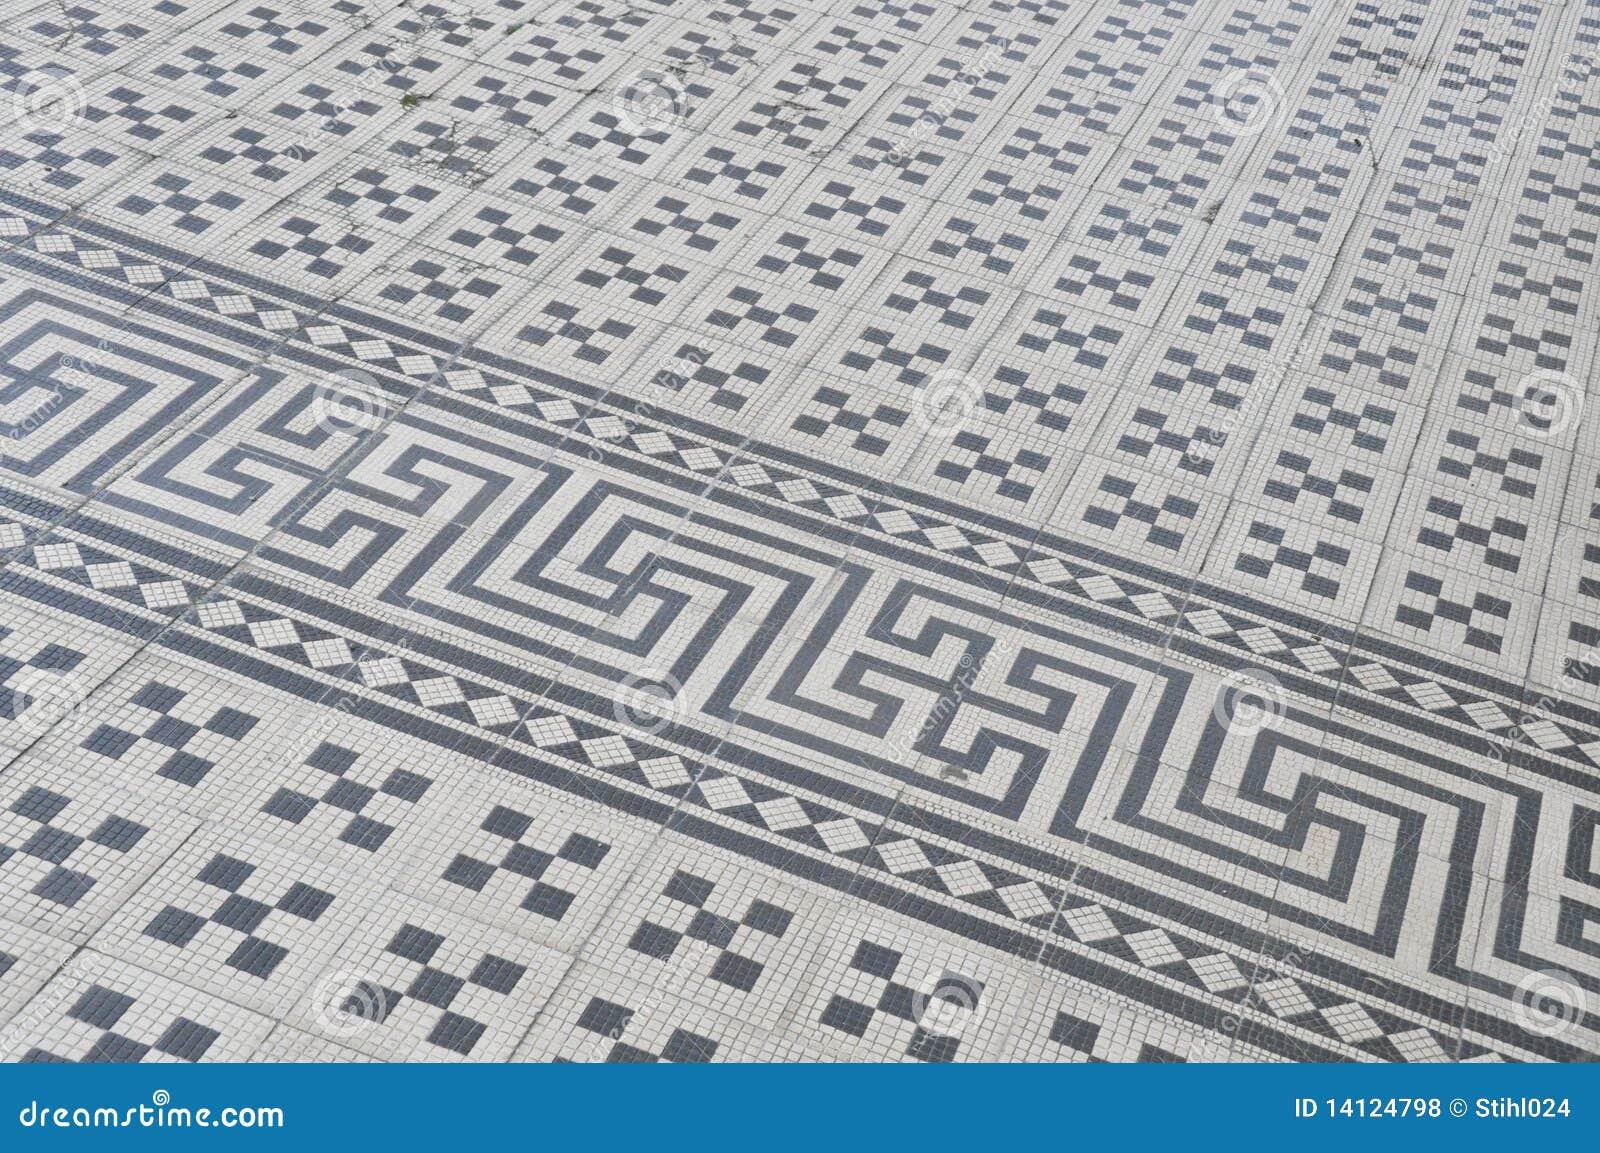 Meander Vintage Ceramic Tiles Royalty Free Stock Photos